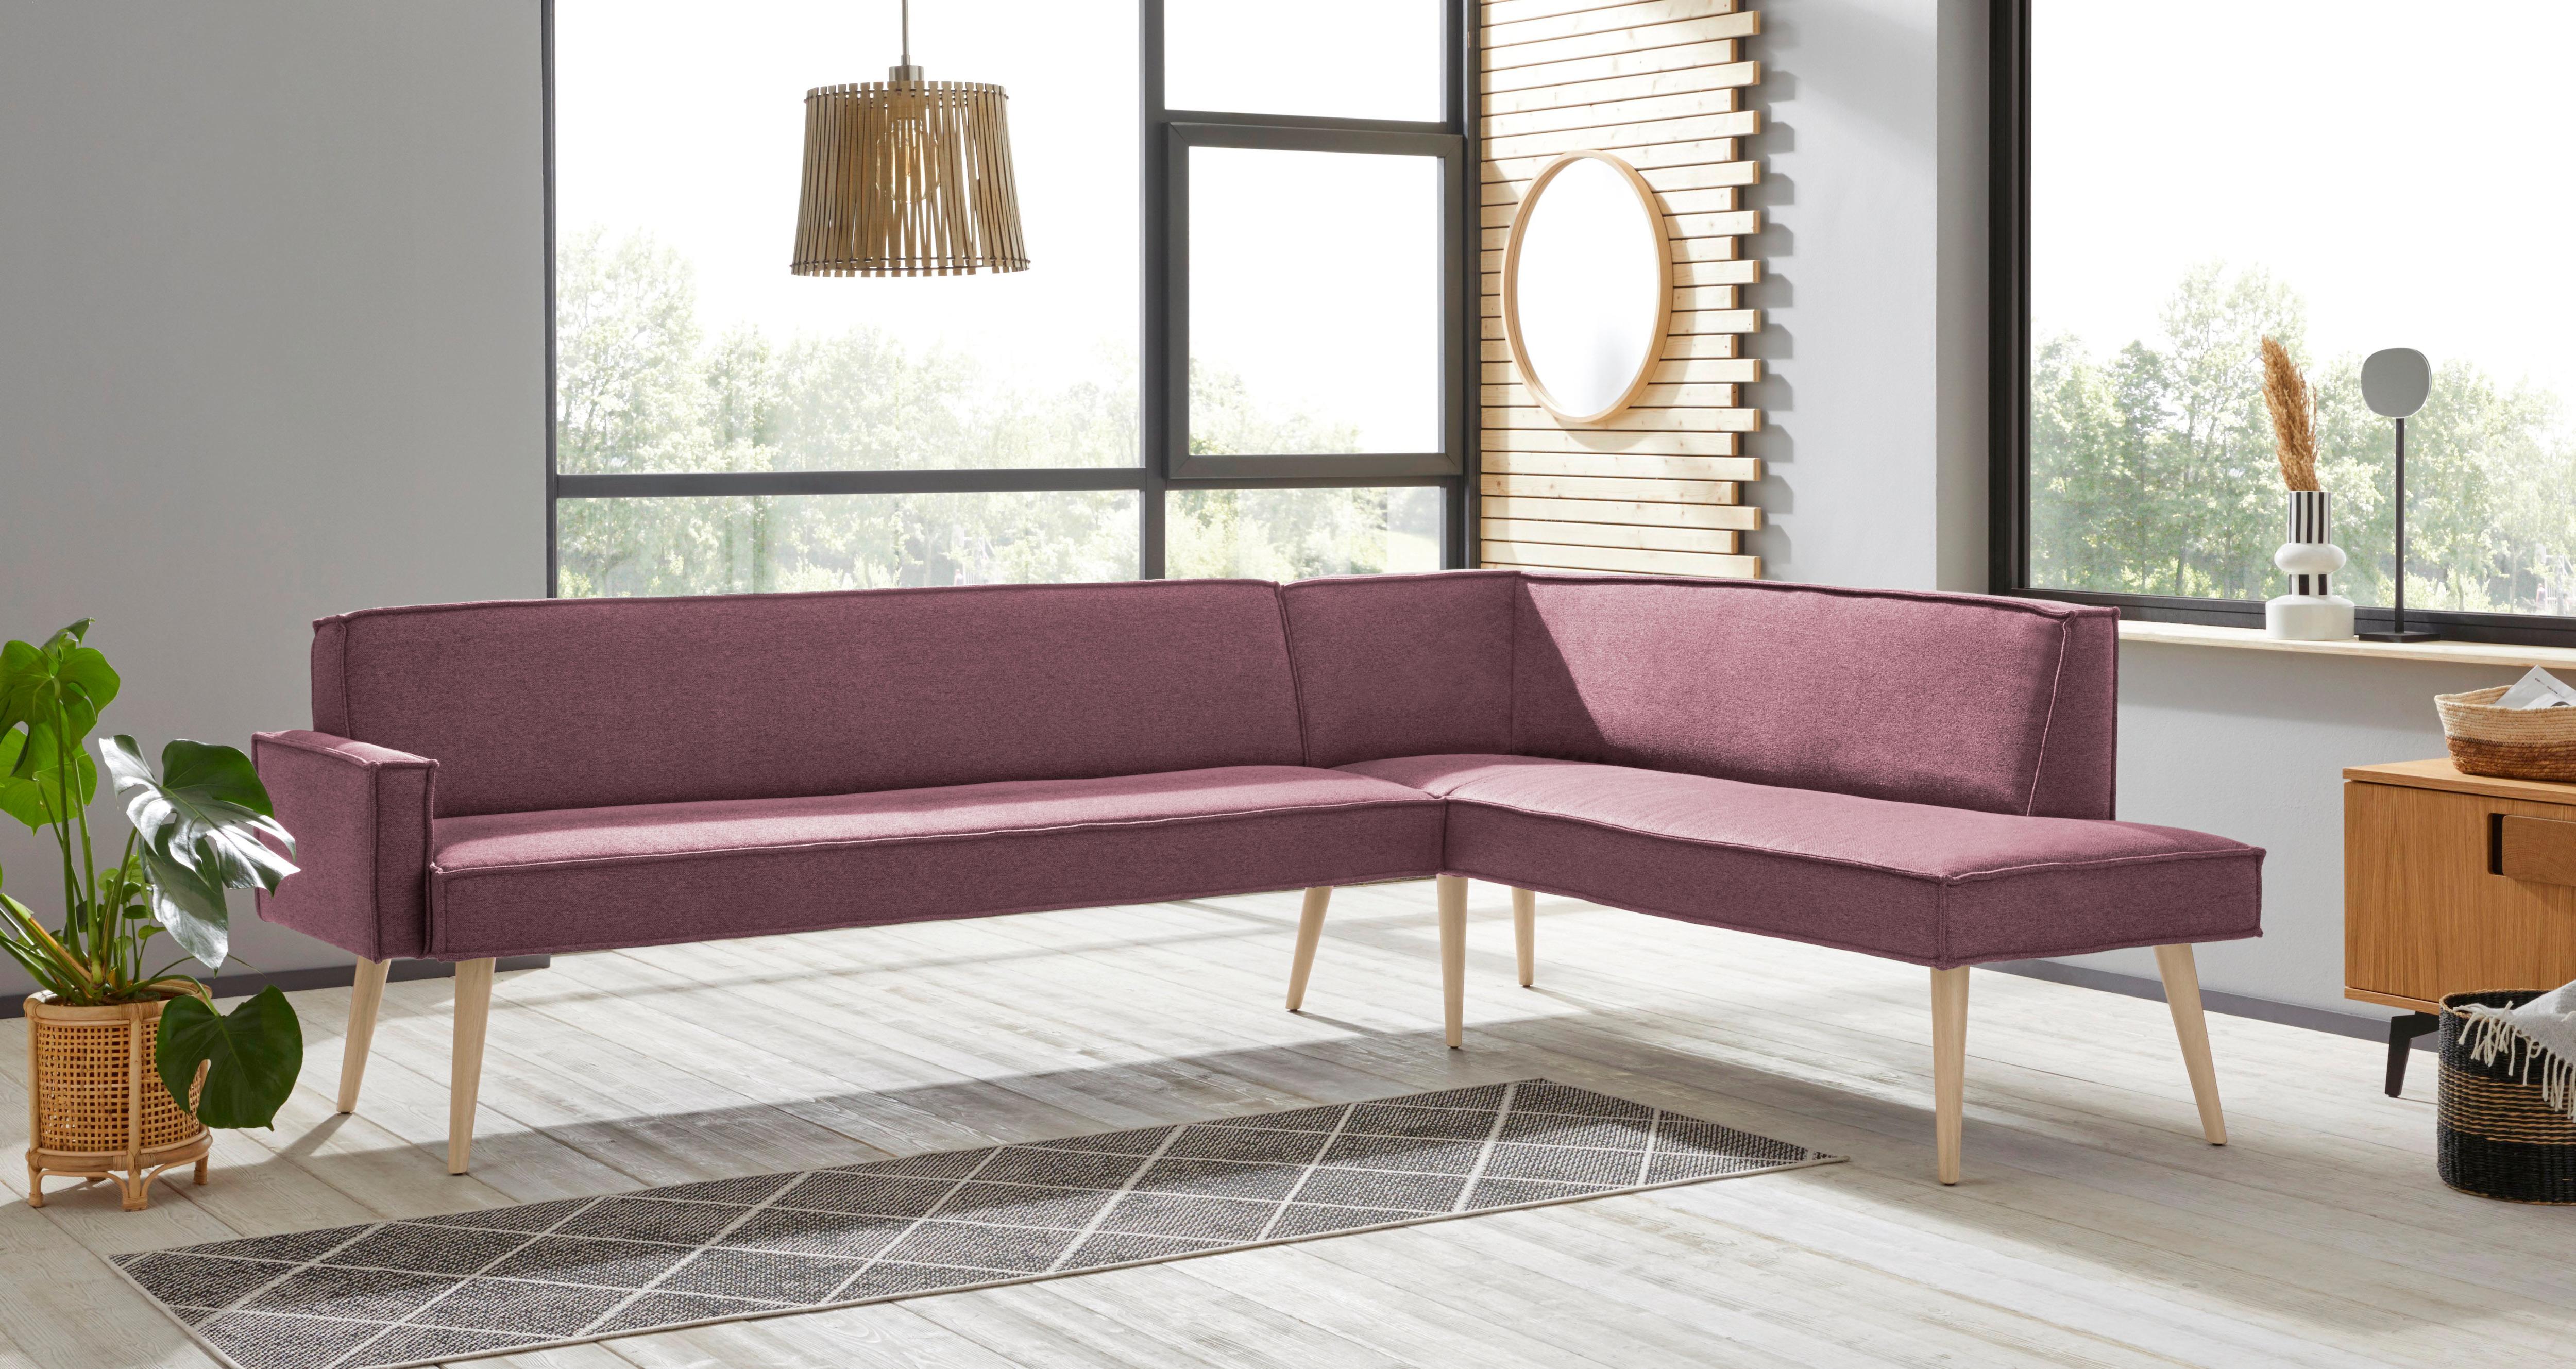 exxpo - sofa fashion Eckbank Lungo, Frei im Raum stellbar günstig online kaufen